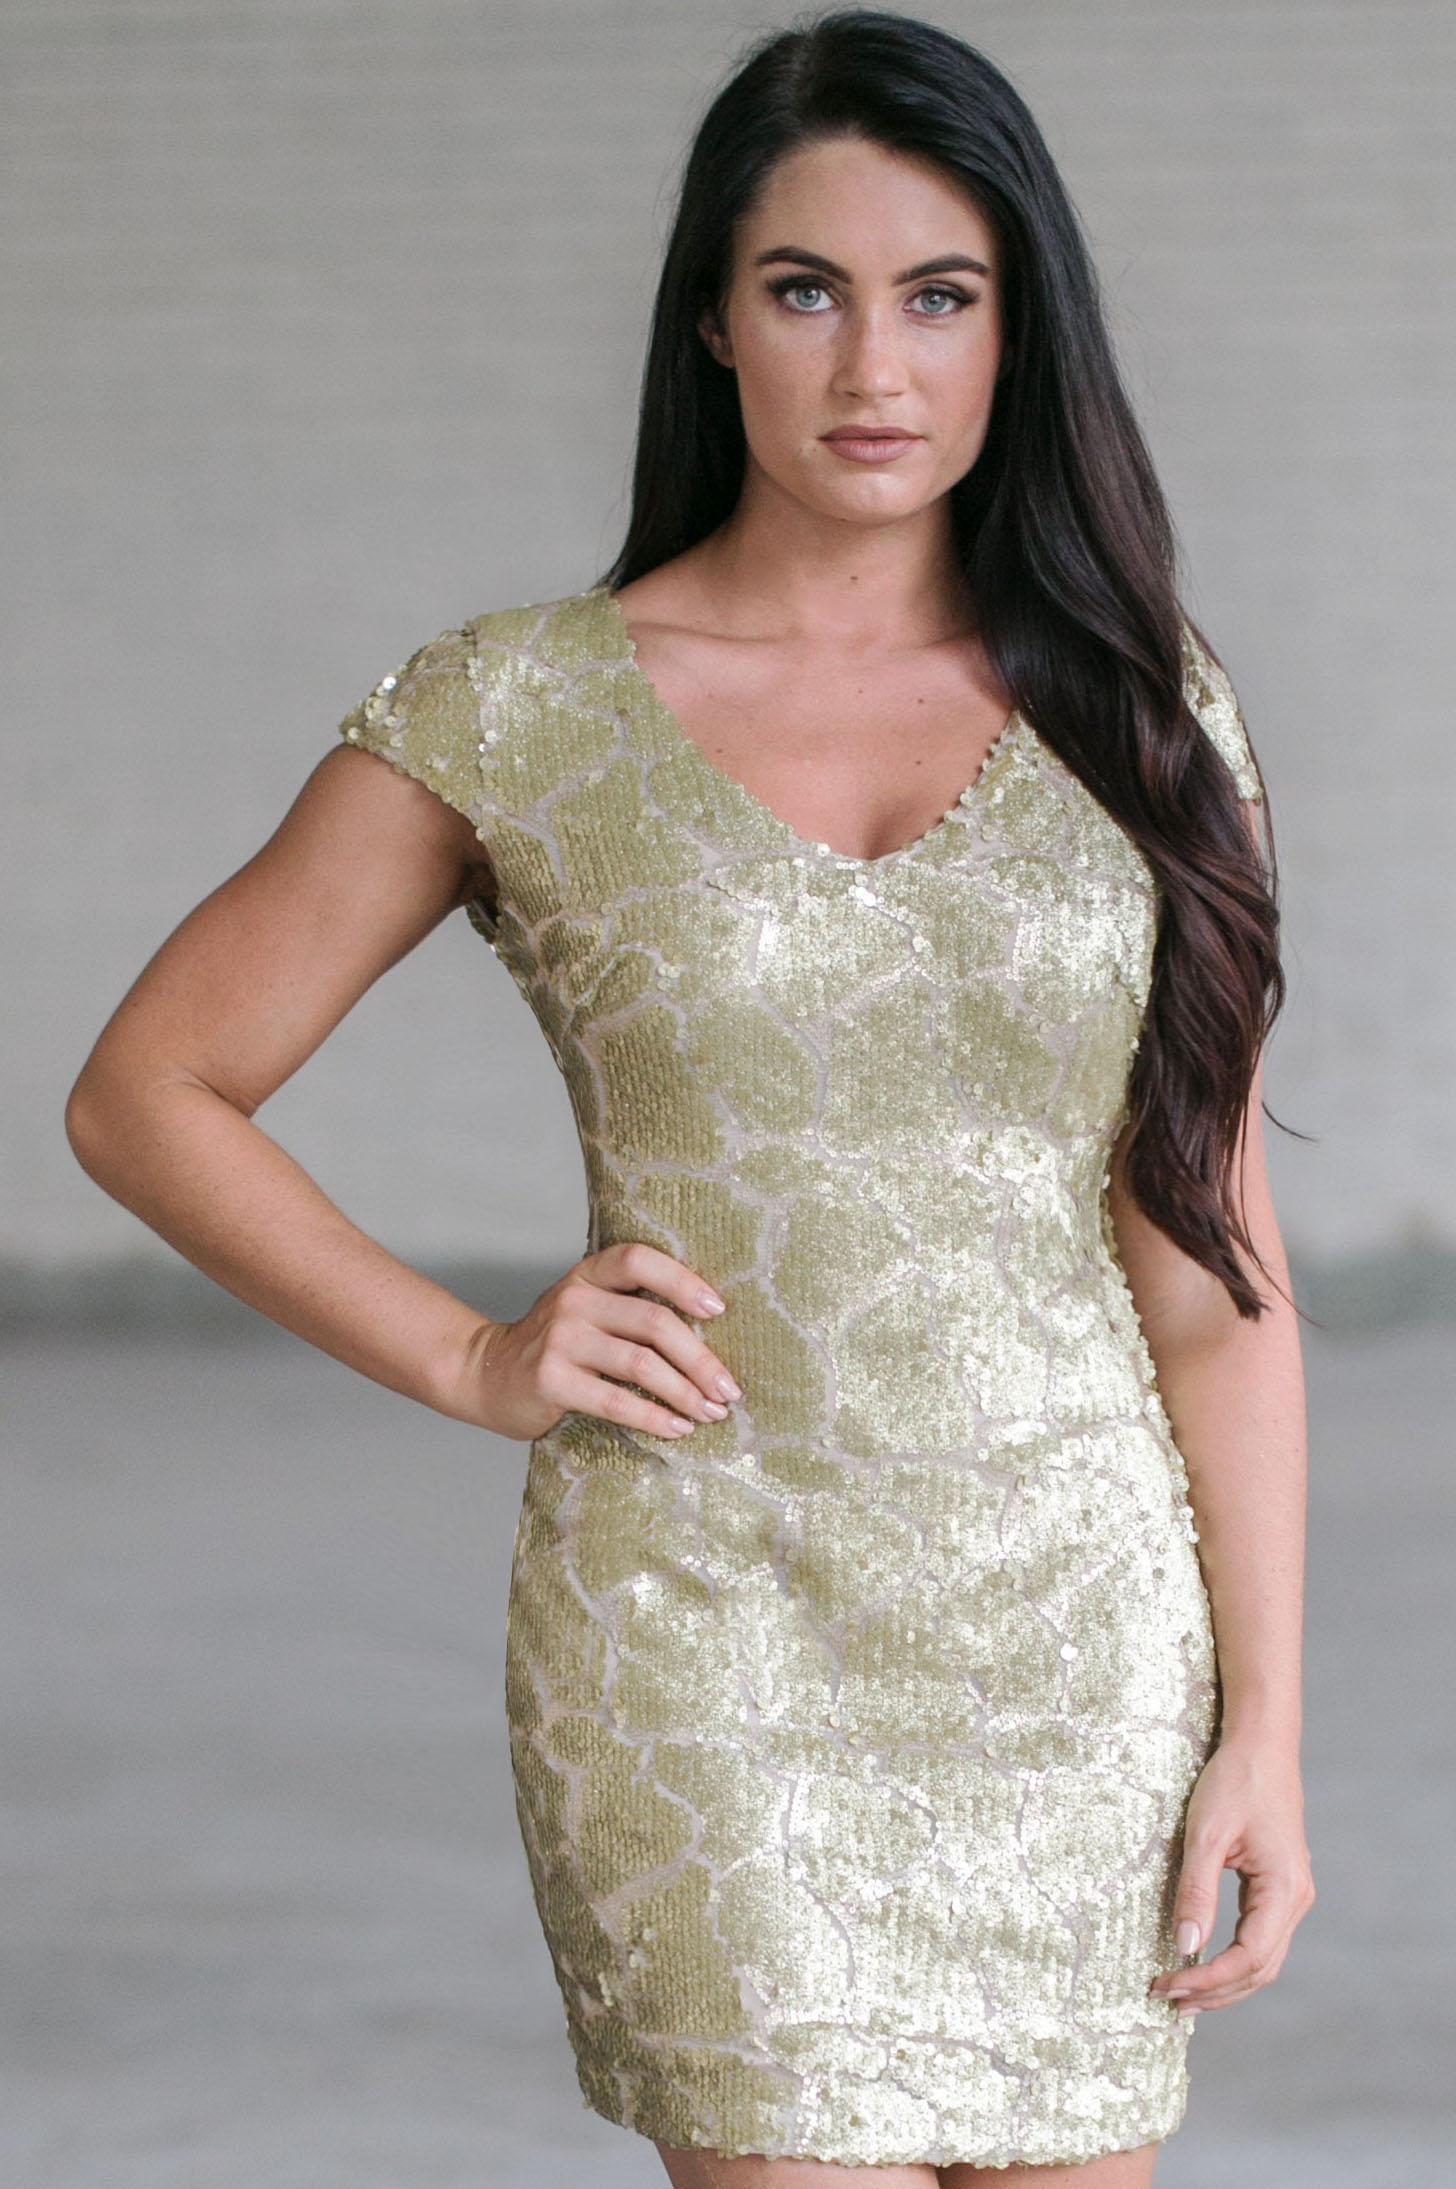 Gold Party Dress, Cute Gold Sequin Cocktail Dress, Boutique Dress ...